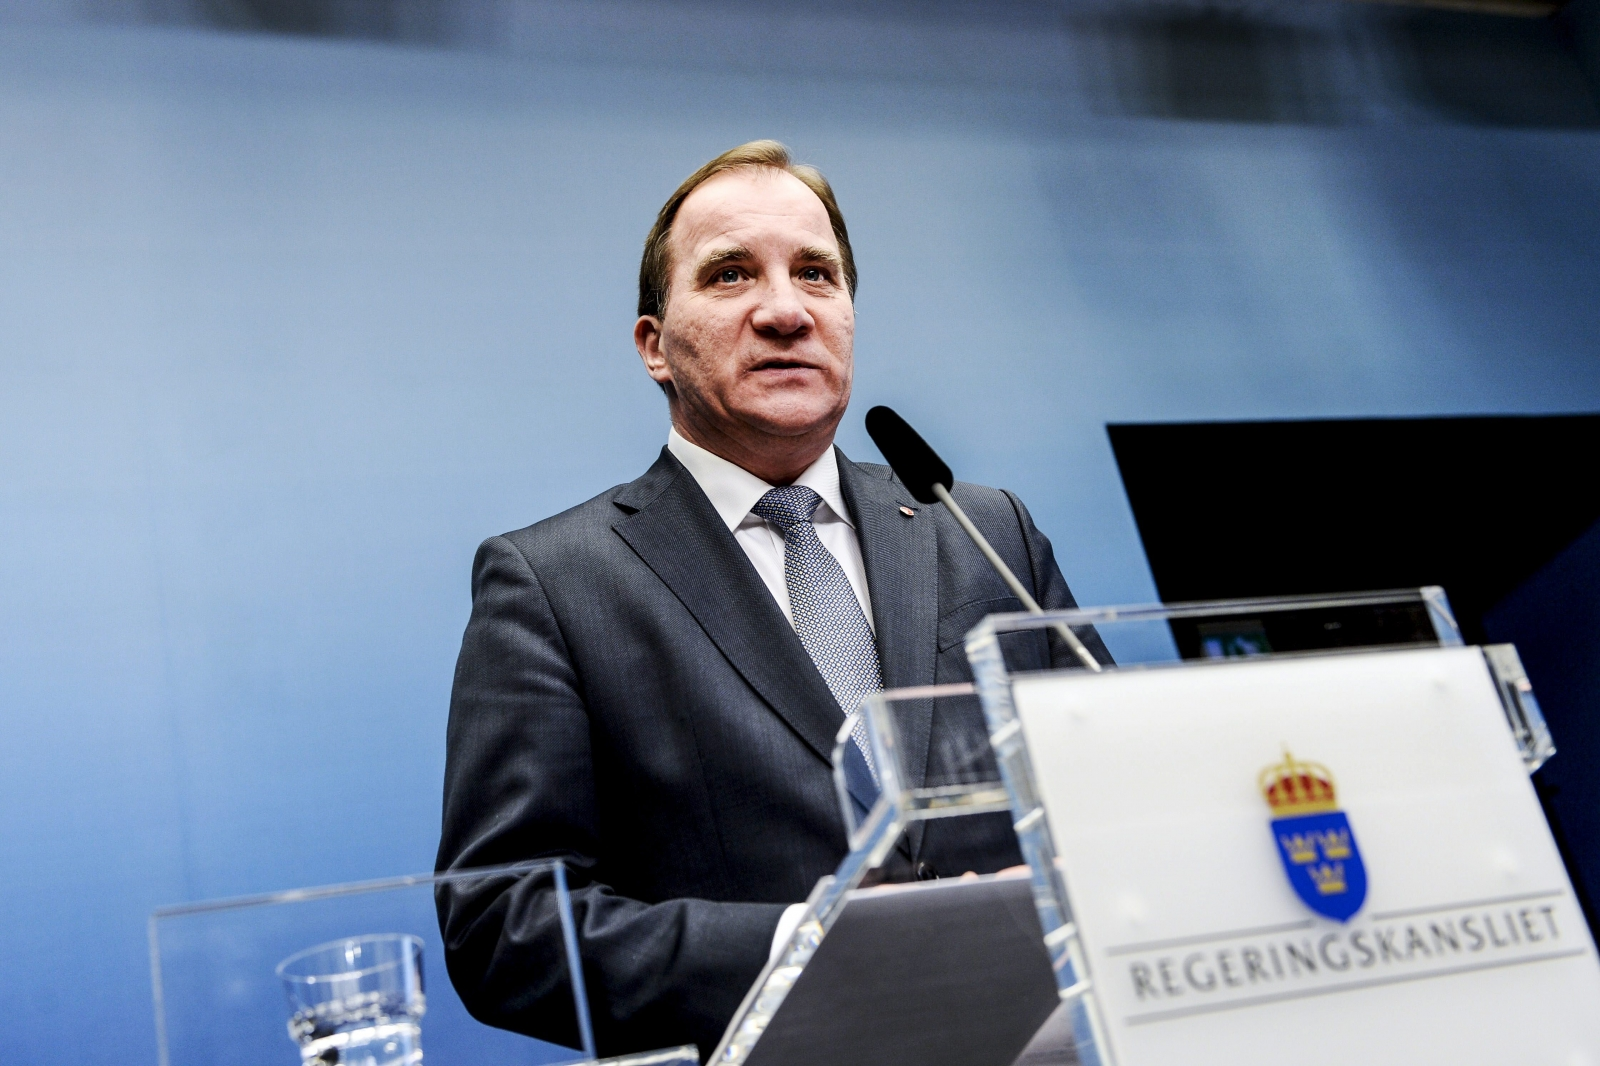 Swedish prime minister Stefan Lofven (Getty)